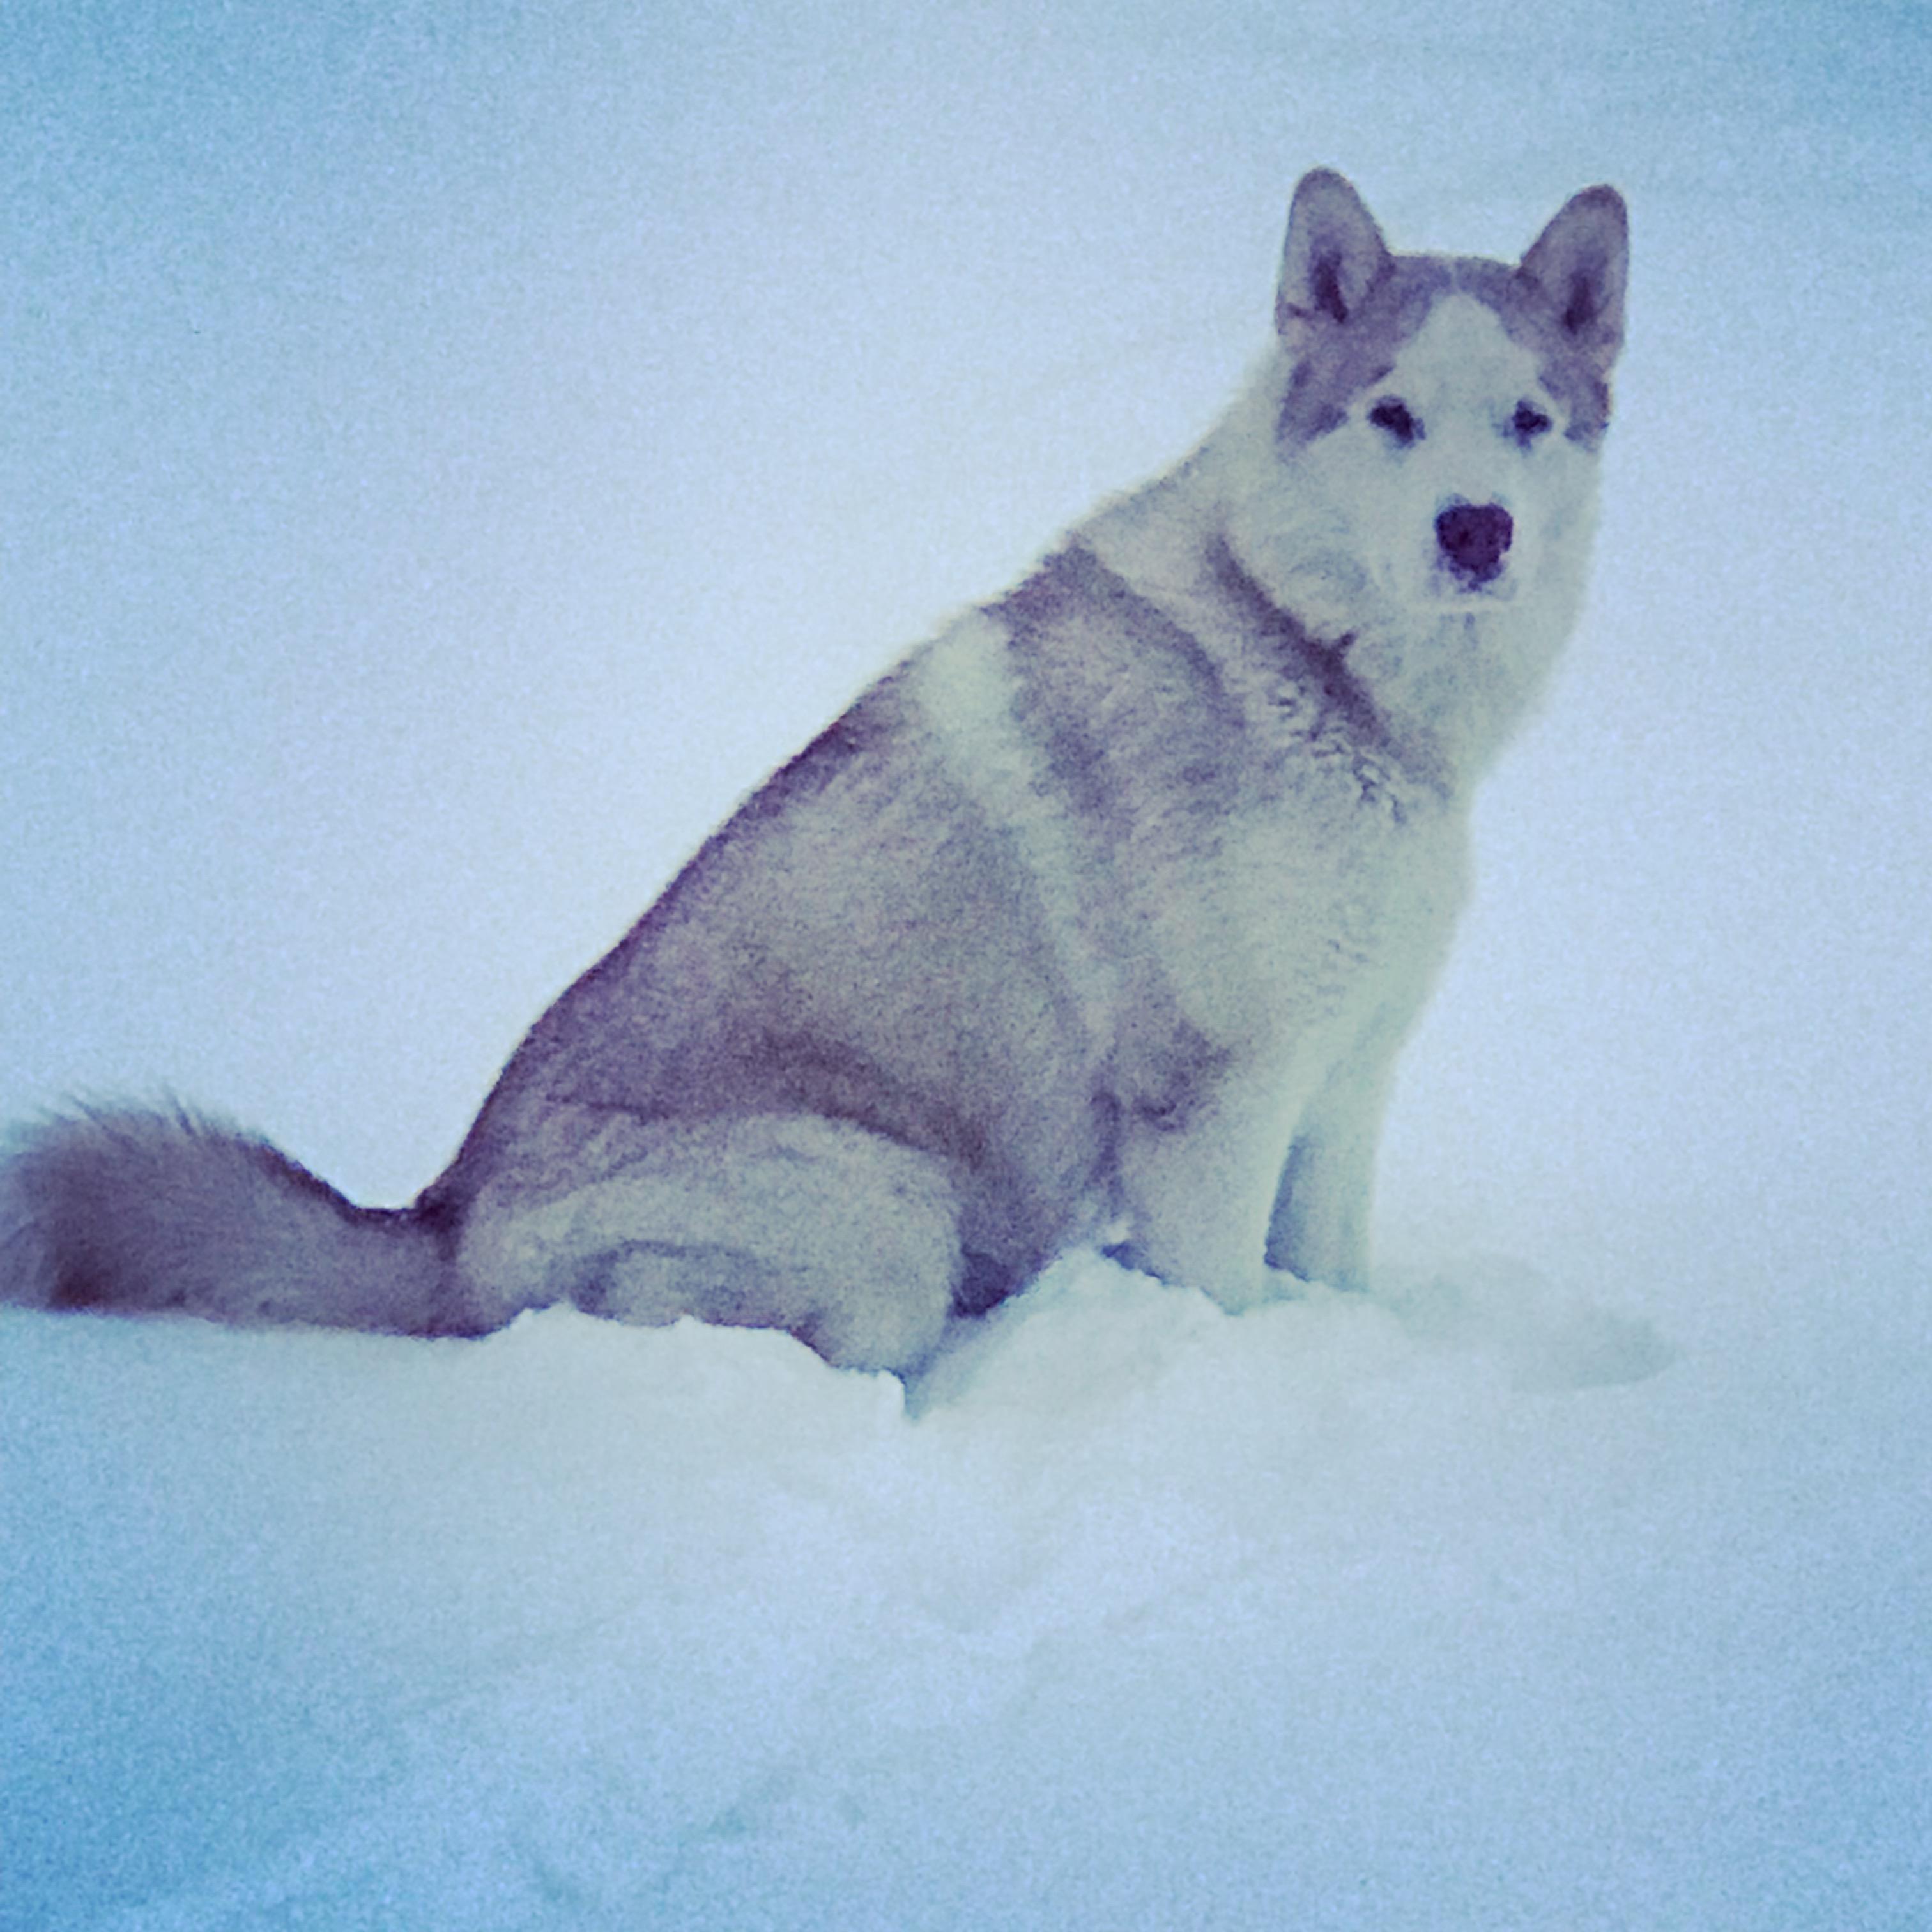 Marley, le Malamute de Romaric à la neige